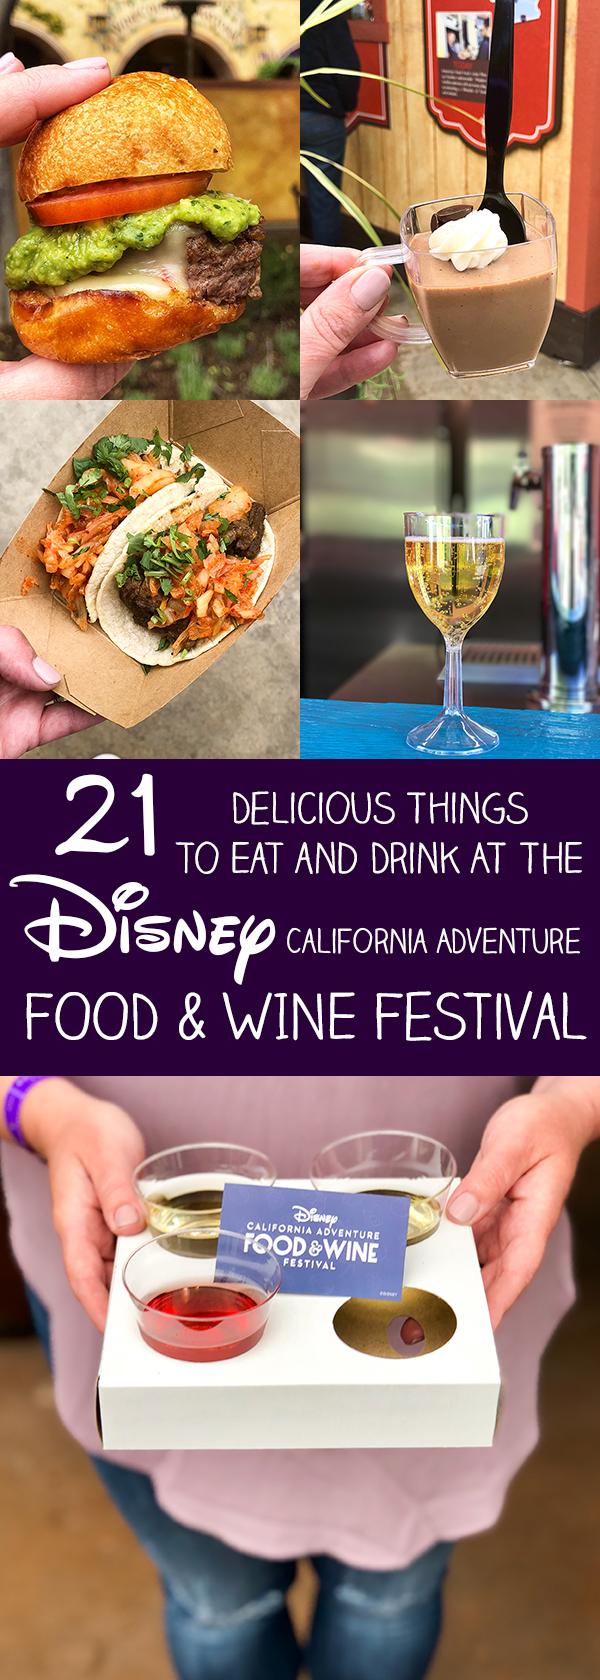 Disney California Adventure Food and Wine Festival at Disneyland